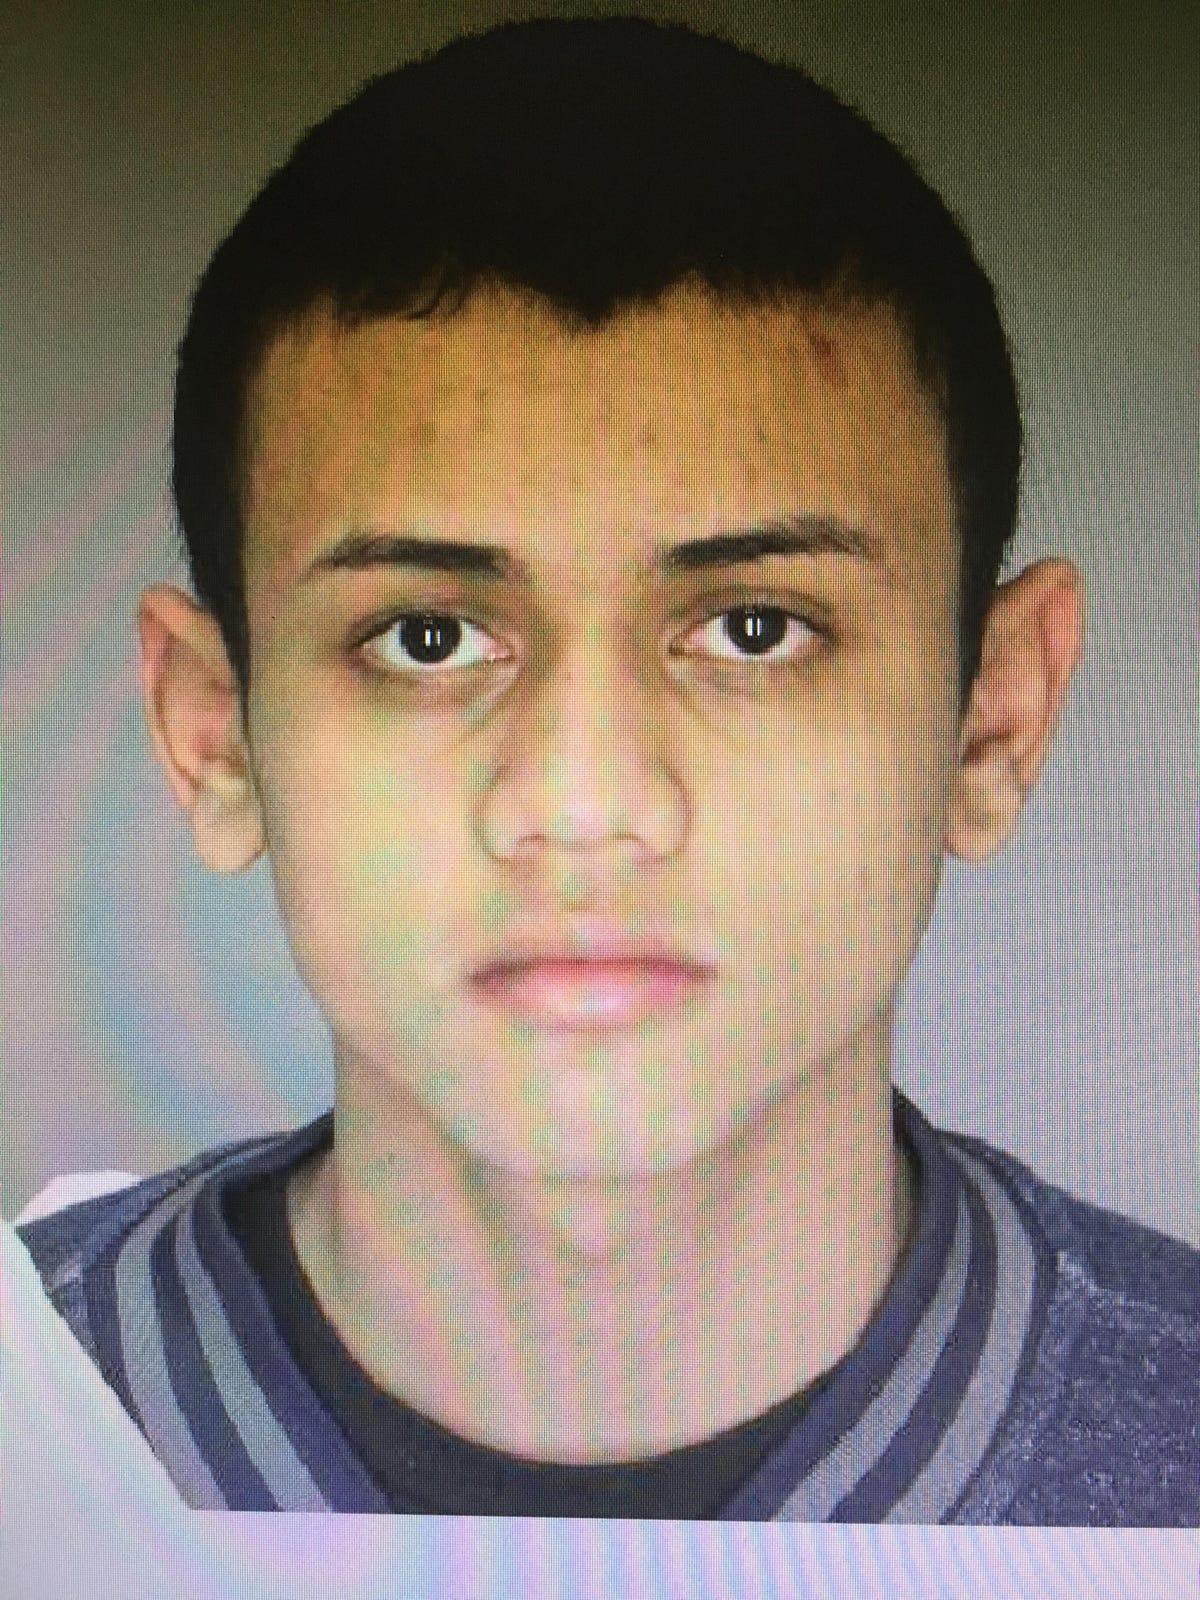 Suffern police arrest armed robbery suspect